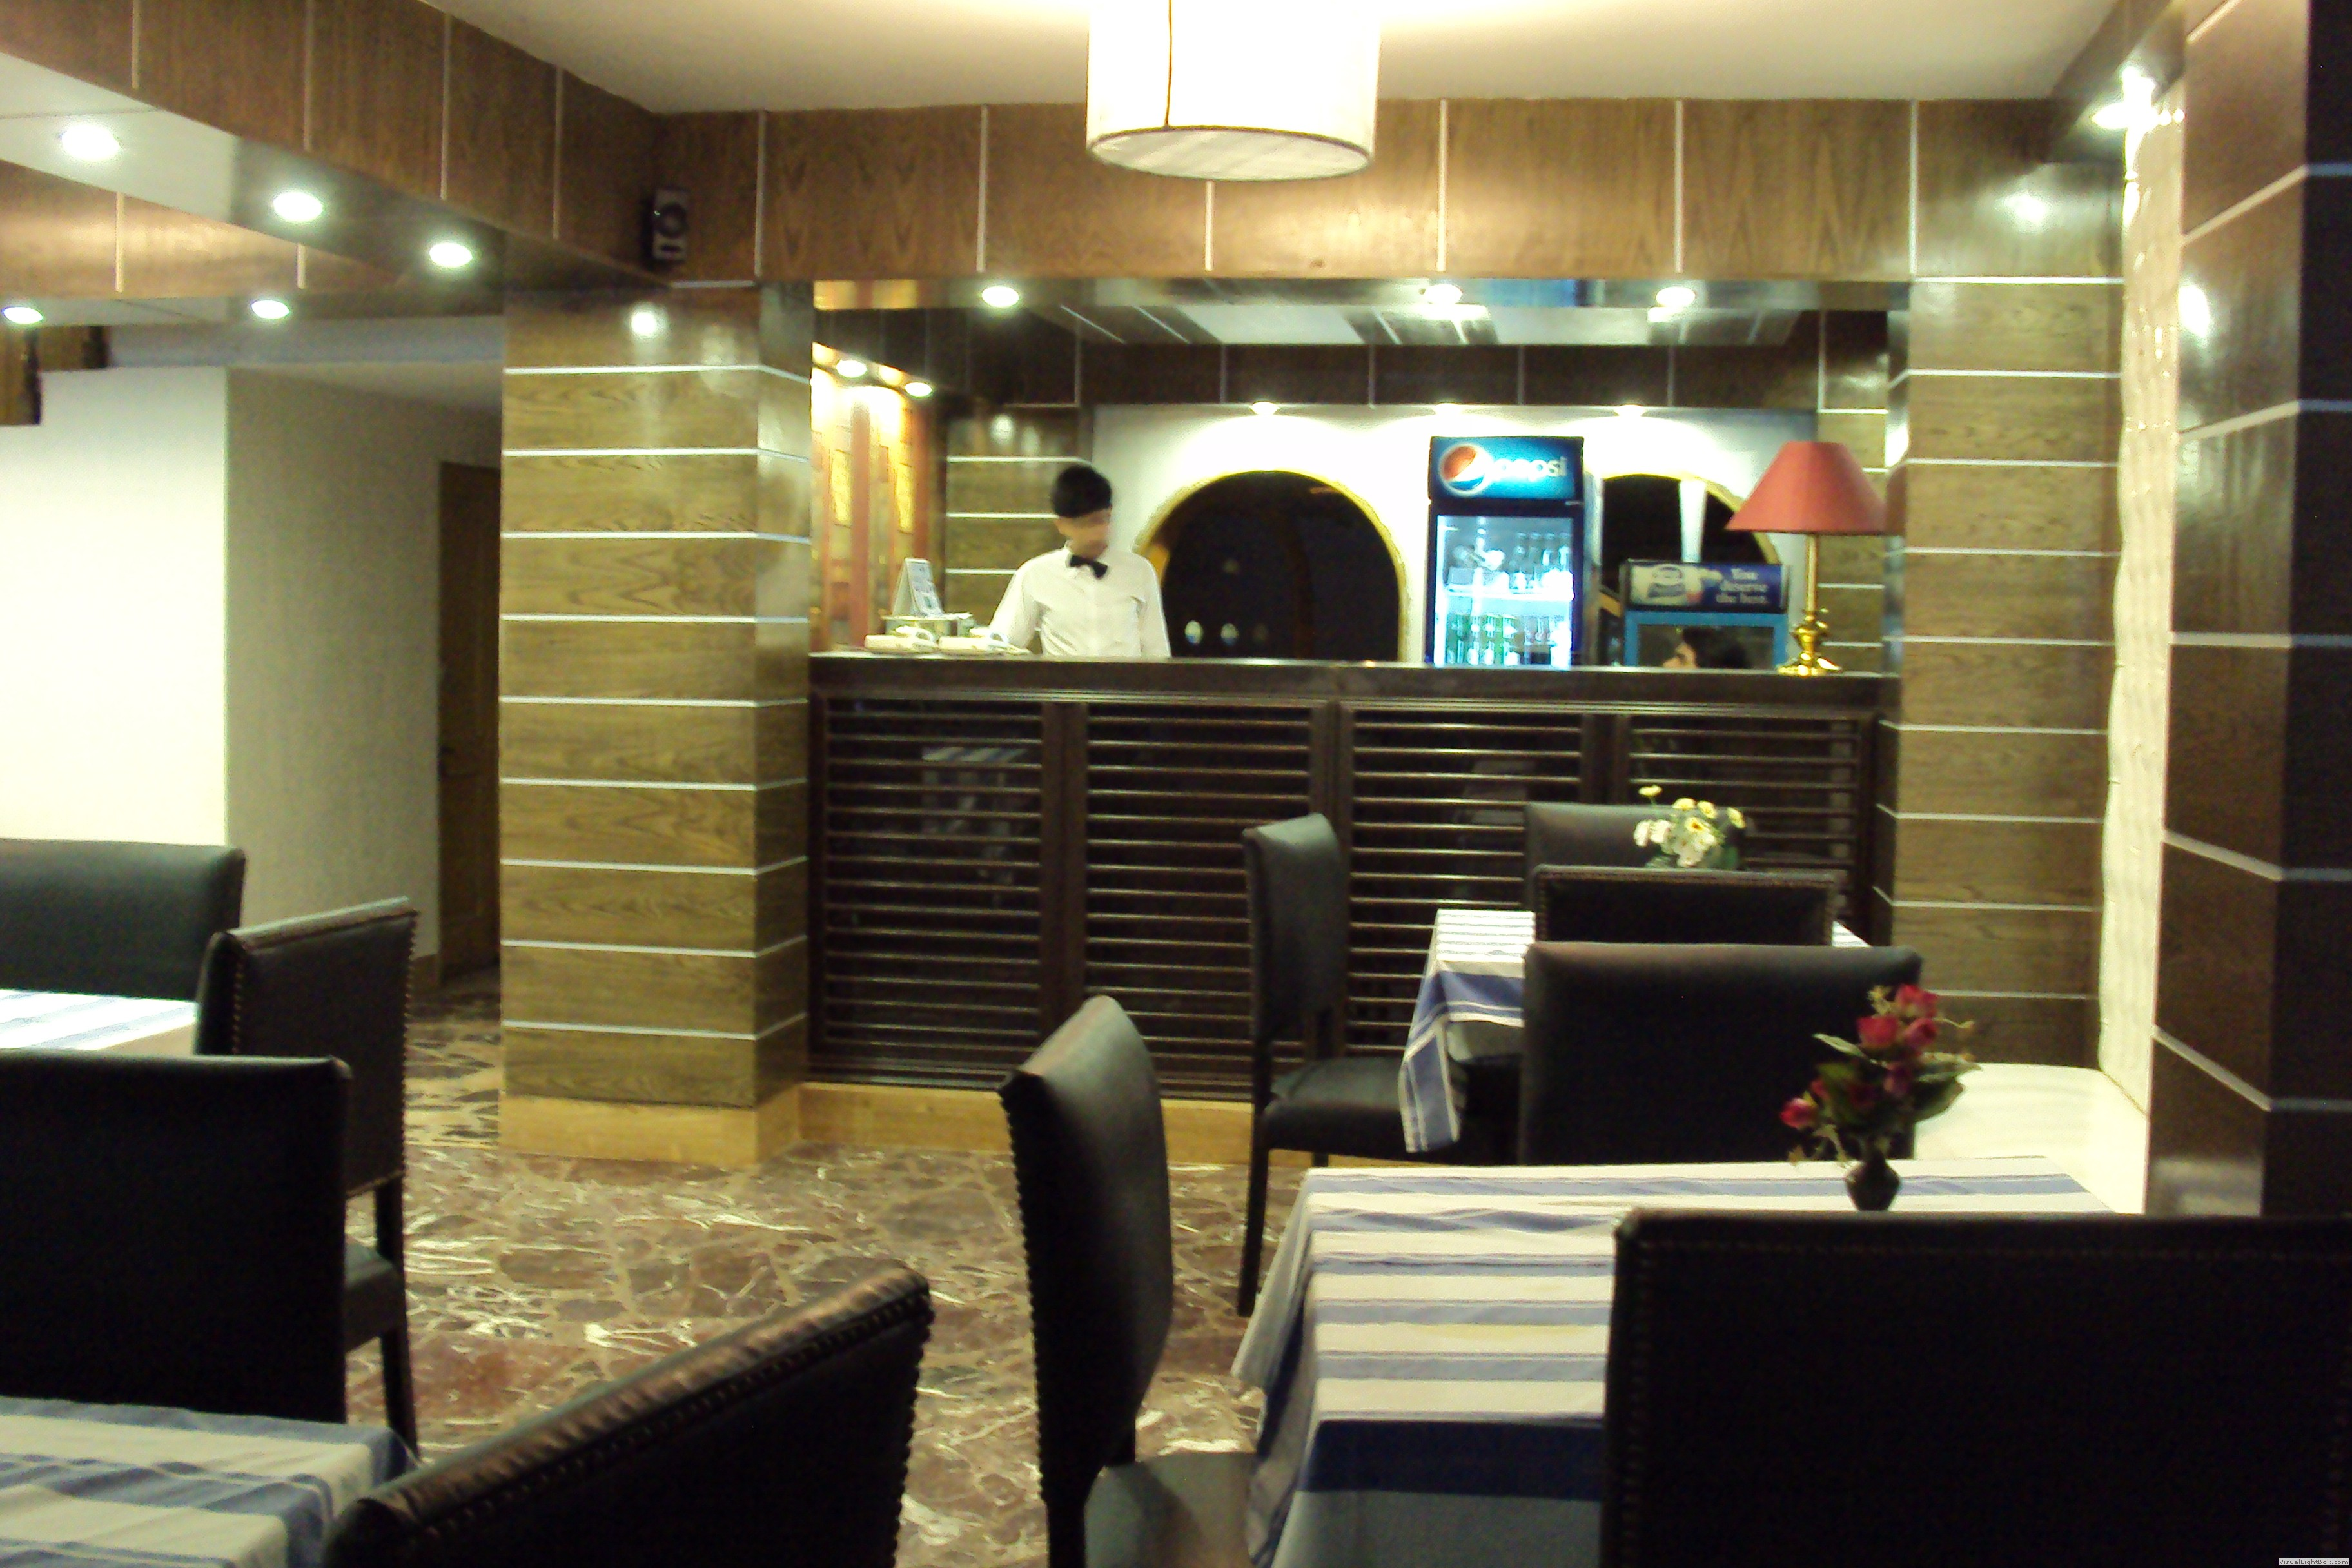 karachi hotels for dating